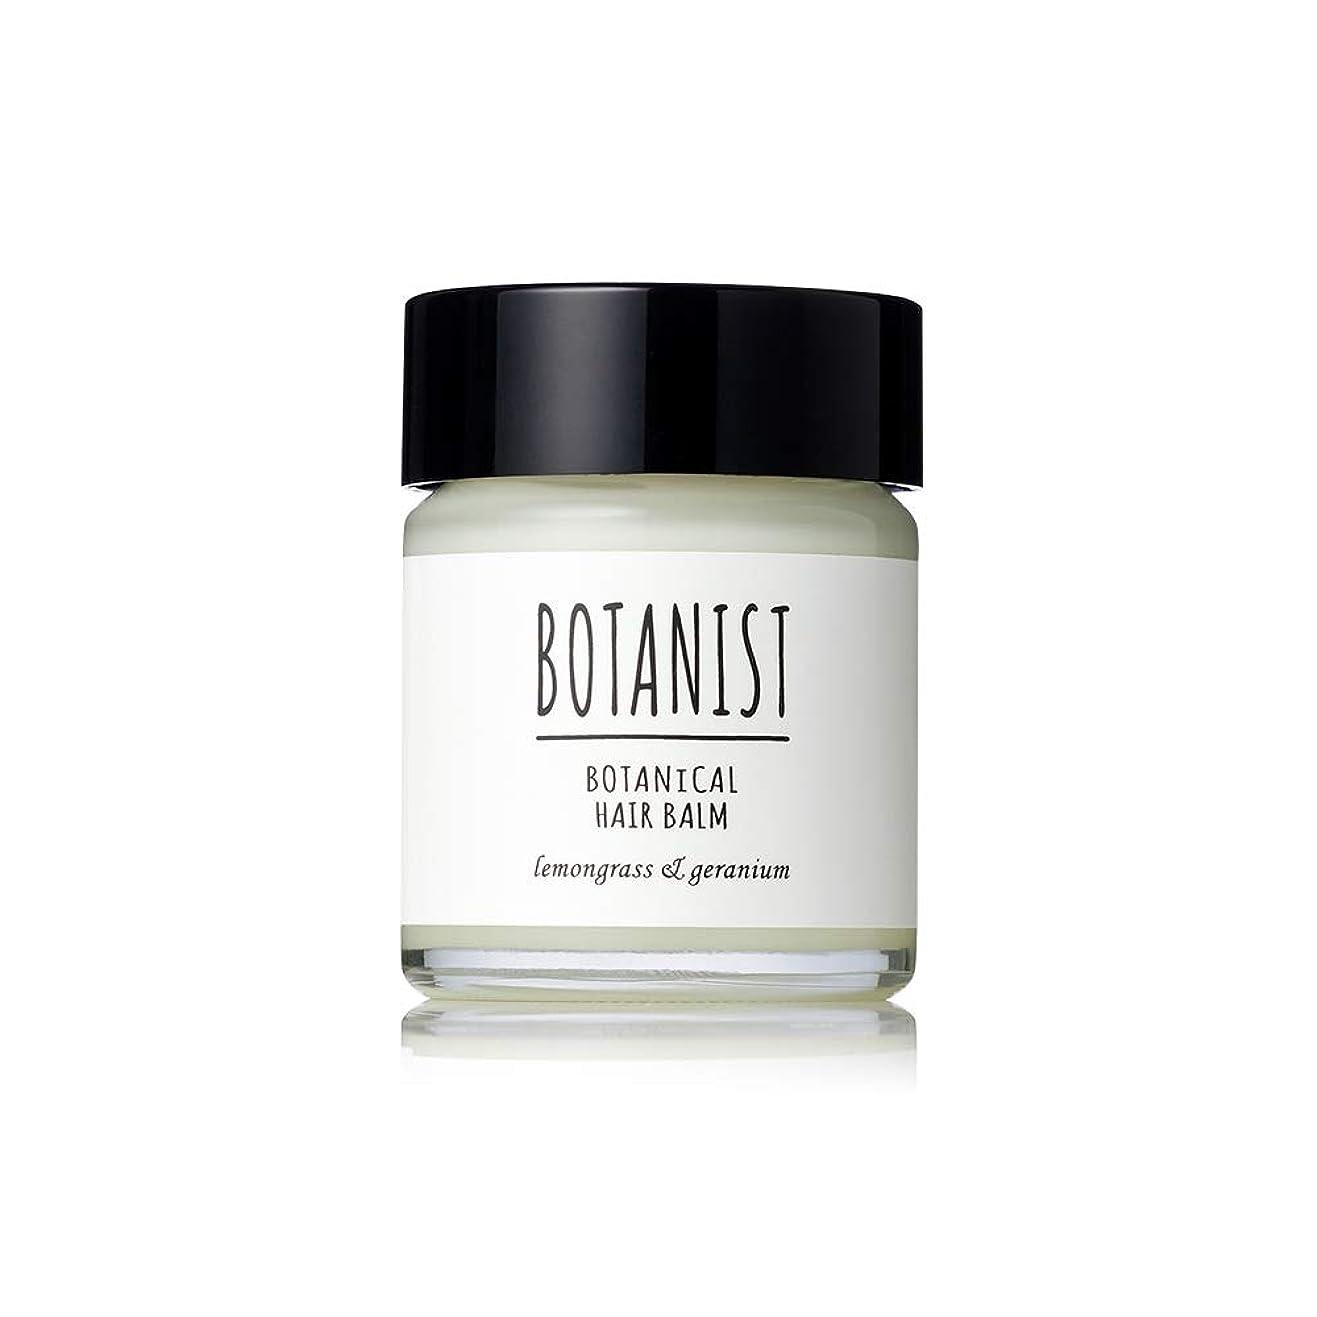 BOTANIST ボタニスト ボタニカルヘアバーム 32g レモングラス&ゼラニウムの香り